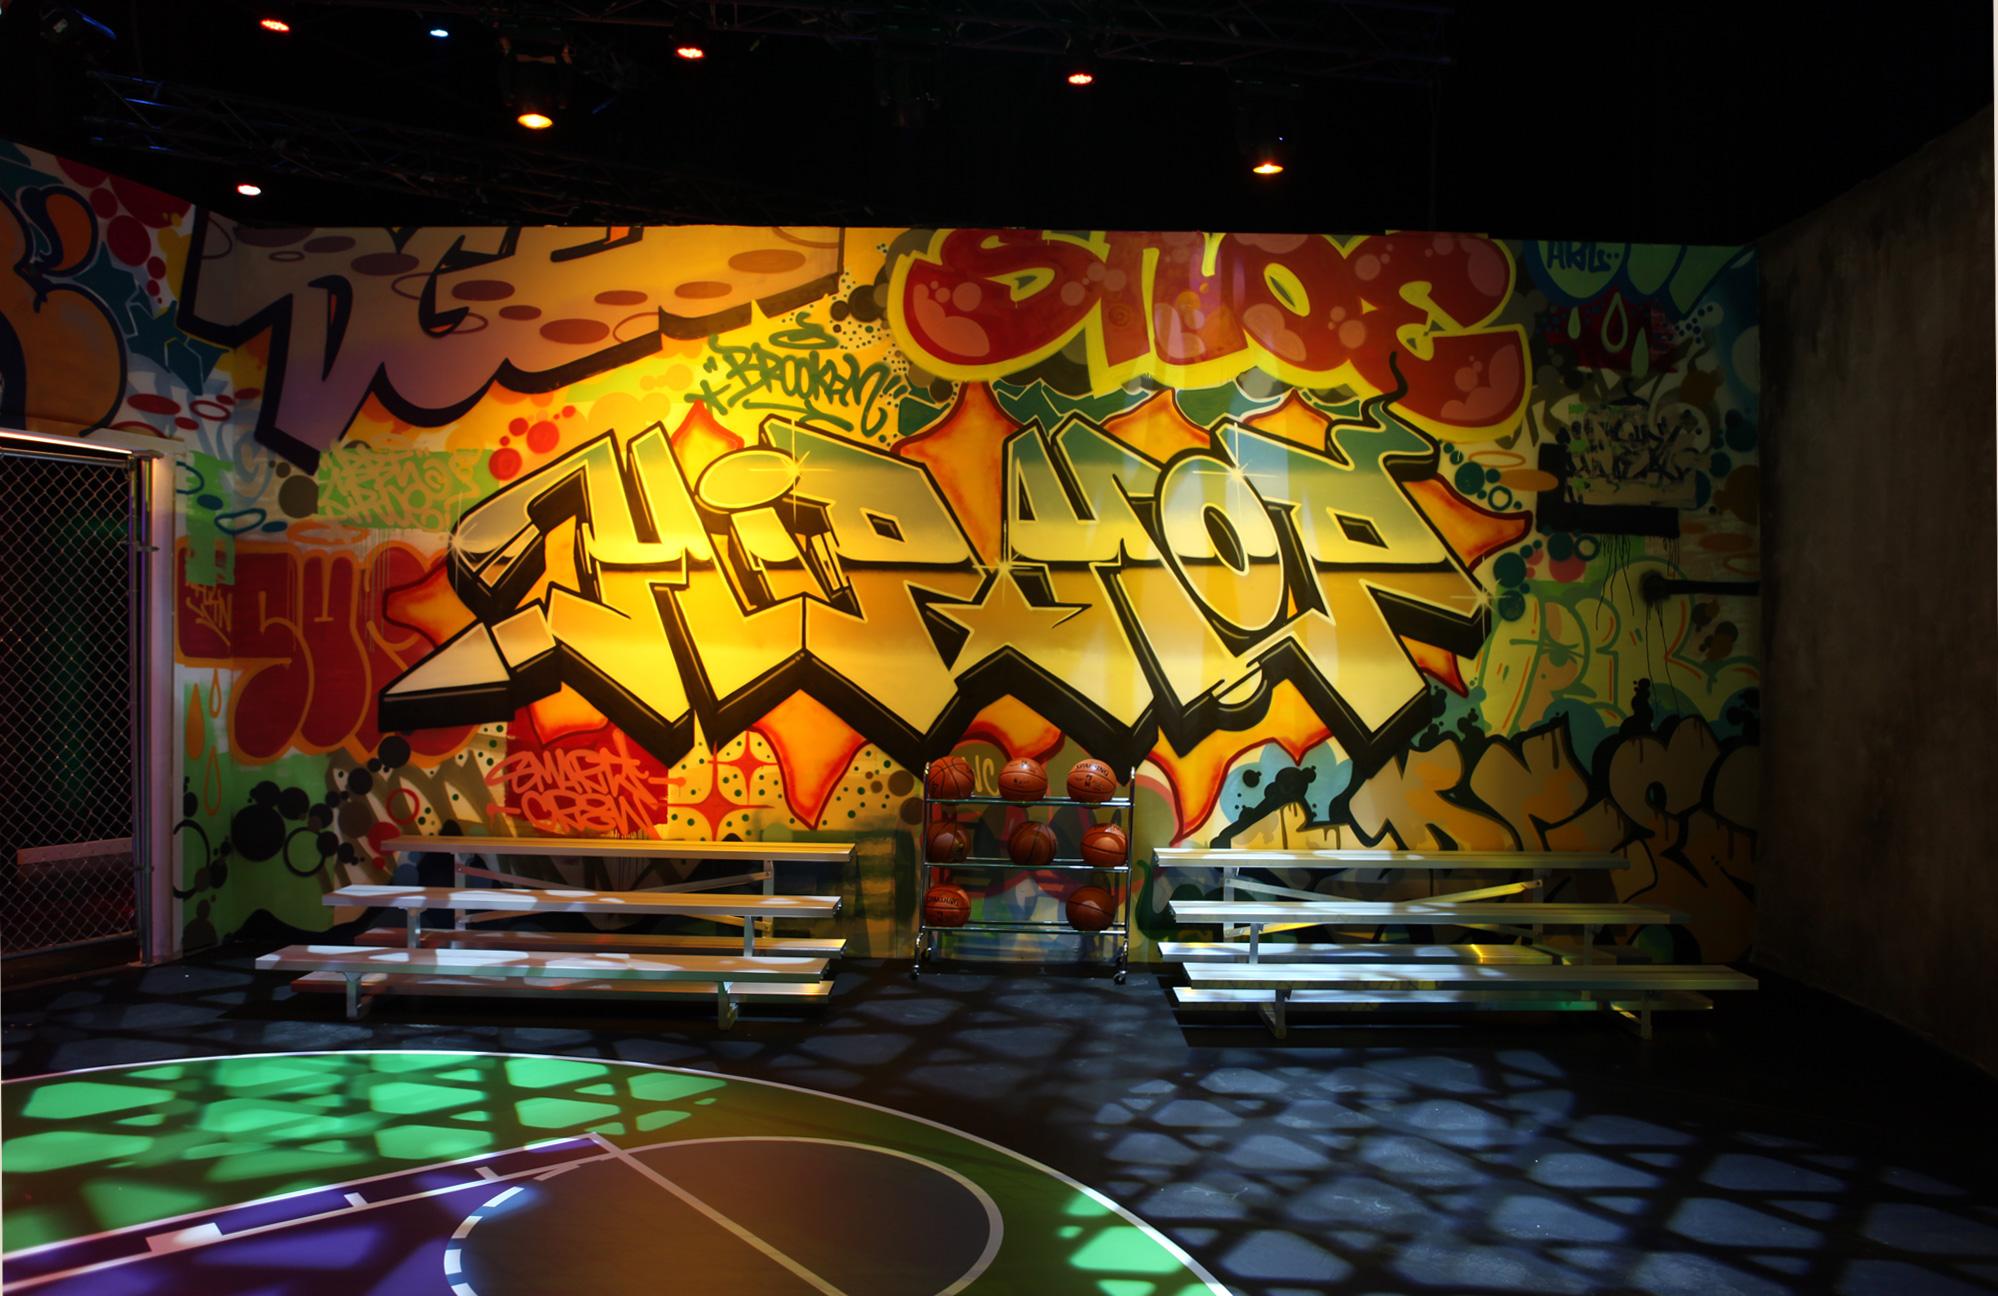 Samsung Milk Music Graffiti Venue Hip-Hop Room